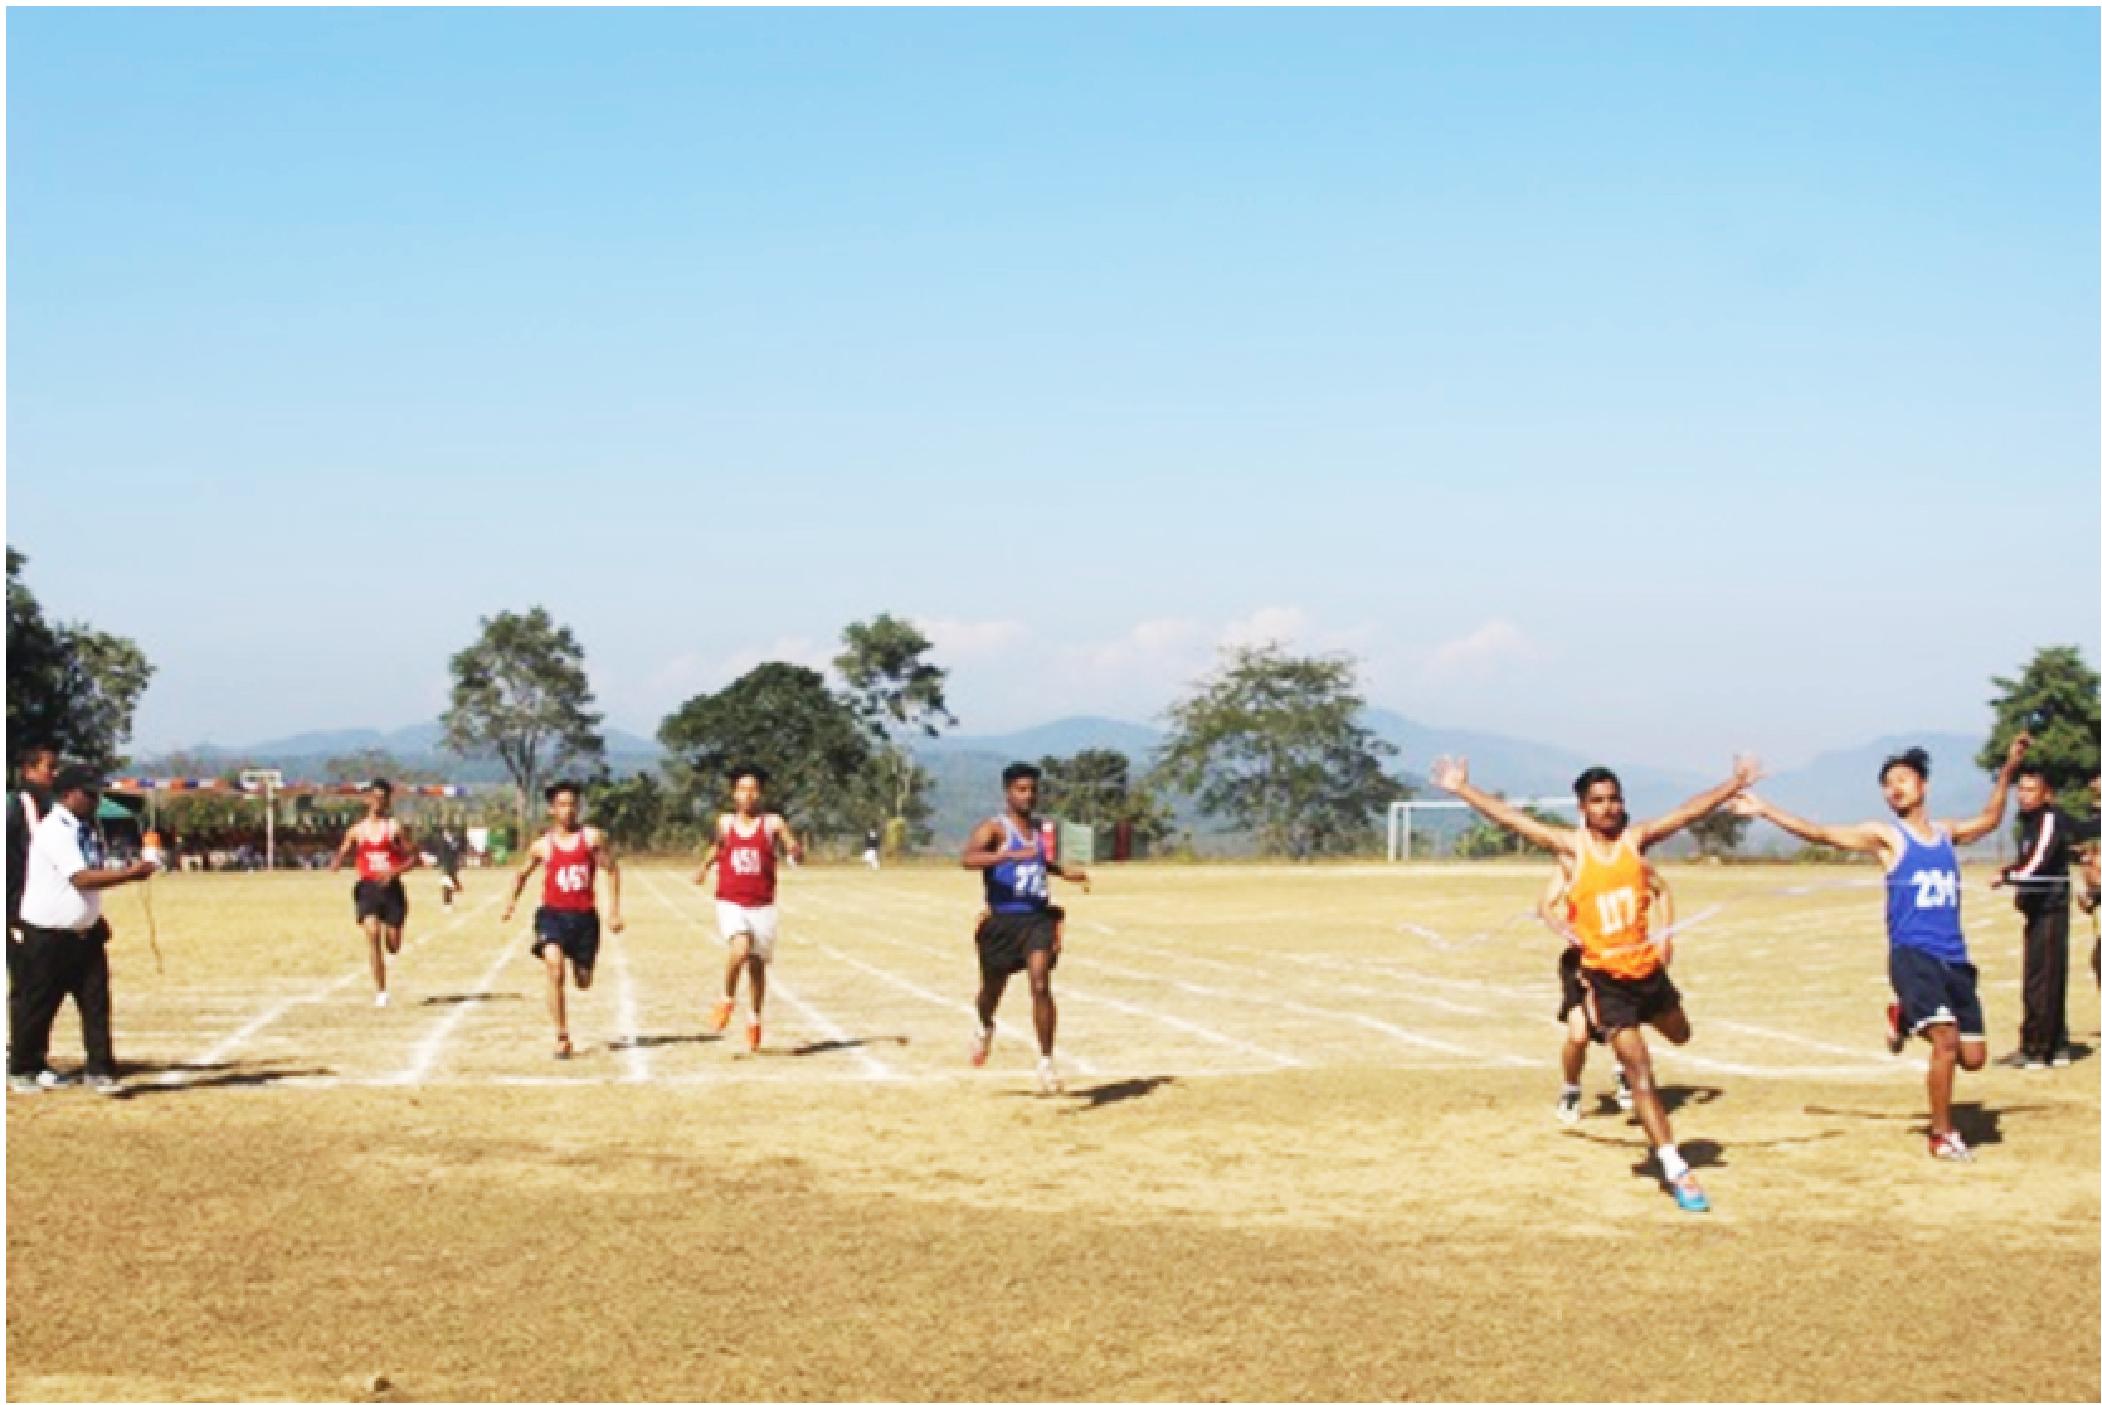 Sainik School Punglwa sports meet concludes